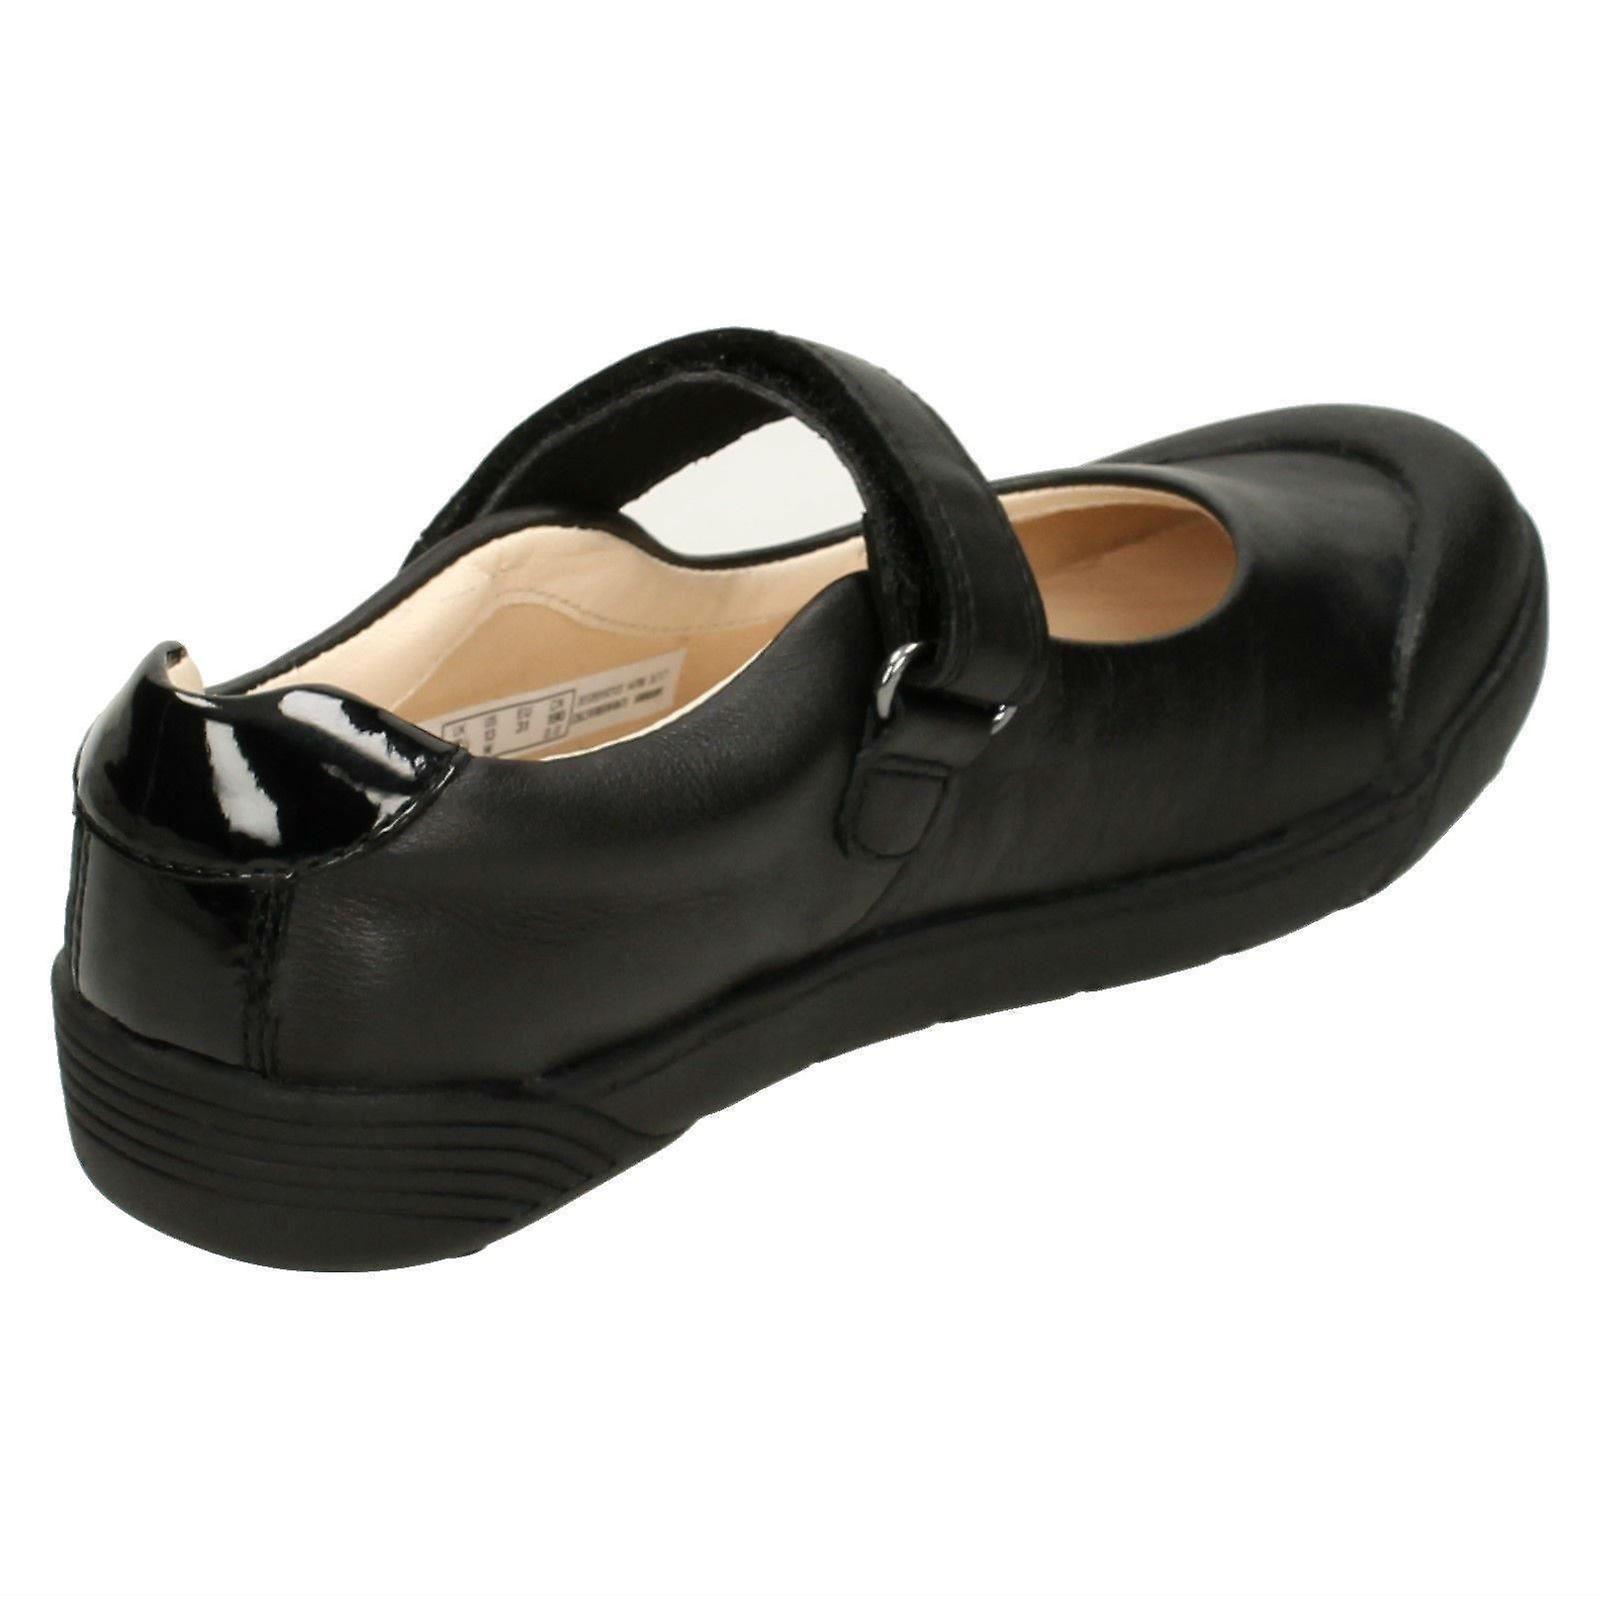 Girls Clarks Leather School Shoes *Lil Folk Bud*